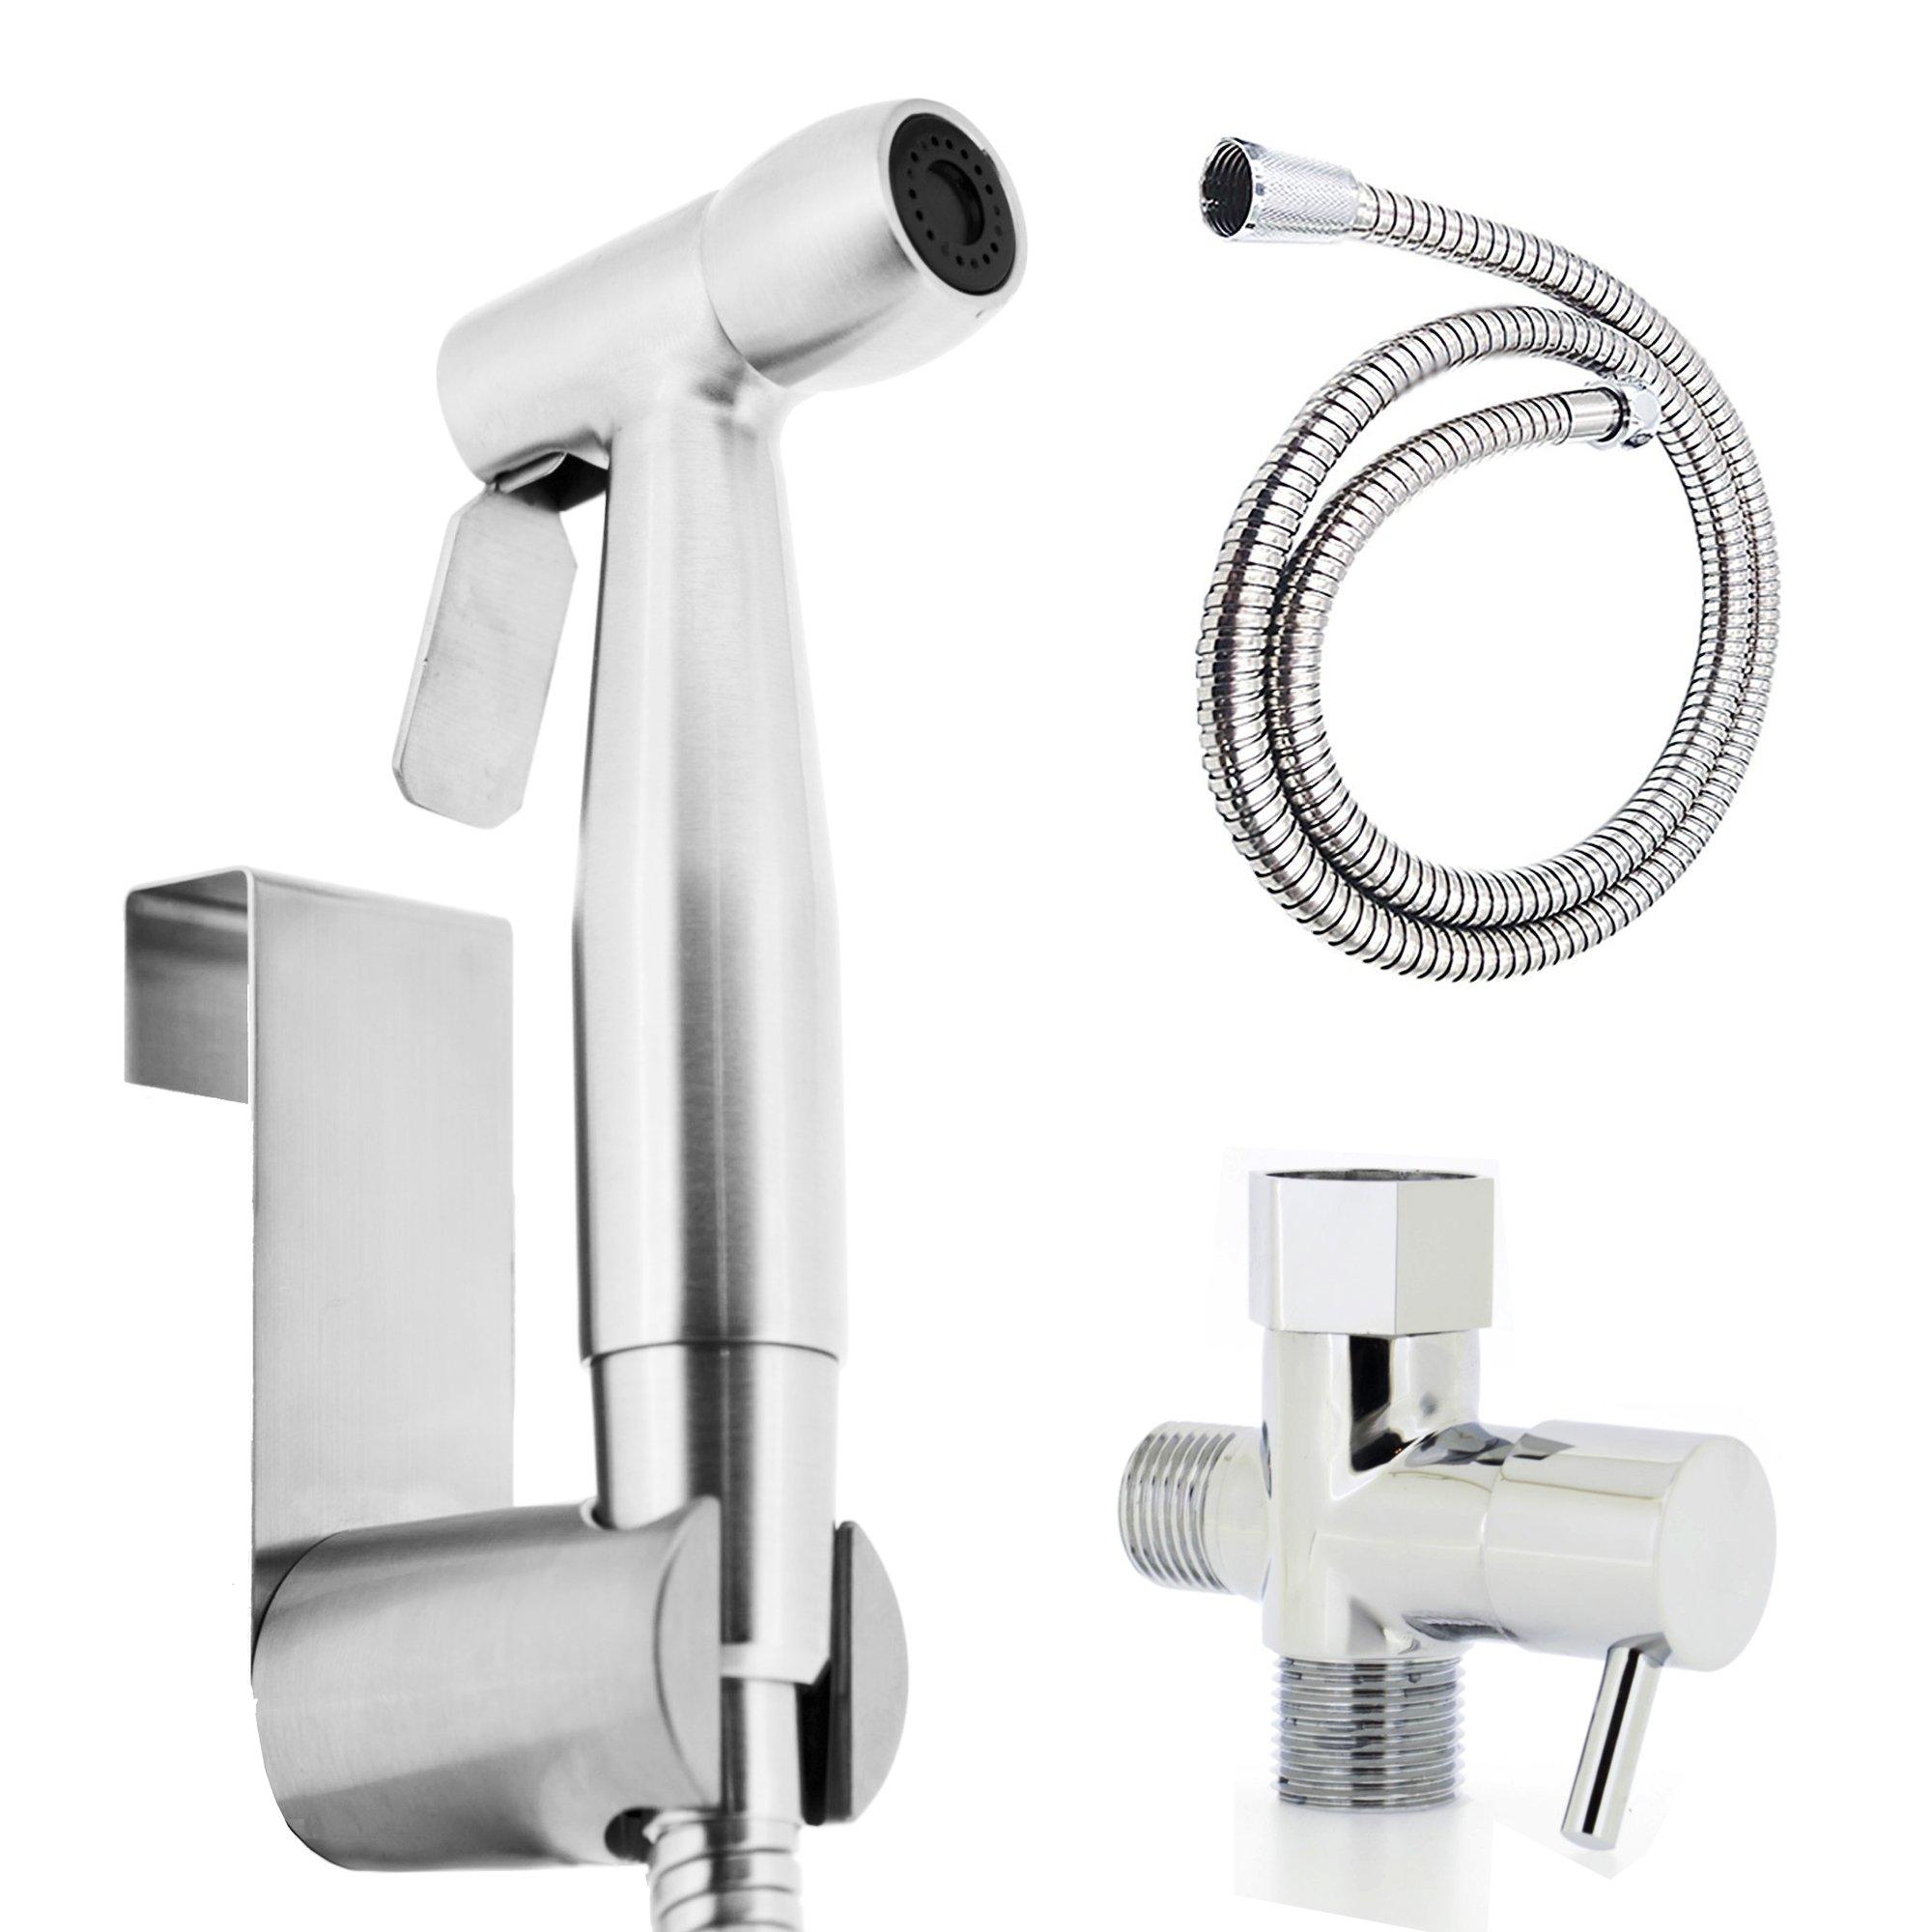 Luxe Hand Held Bidet Sprayer Muslim Shower Shattaf Diaper Sprayer Attachment Kit Stainless Steel w Metal Hose, Hanger and Adapter